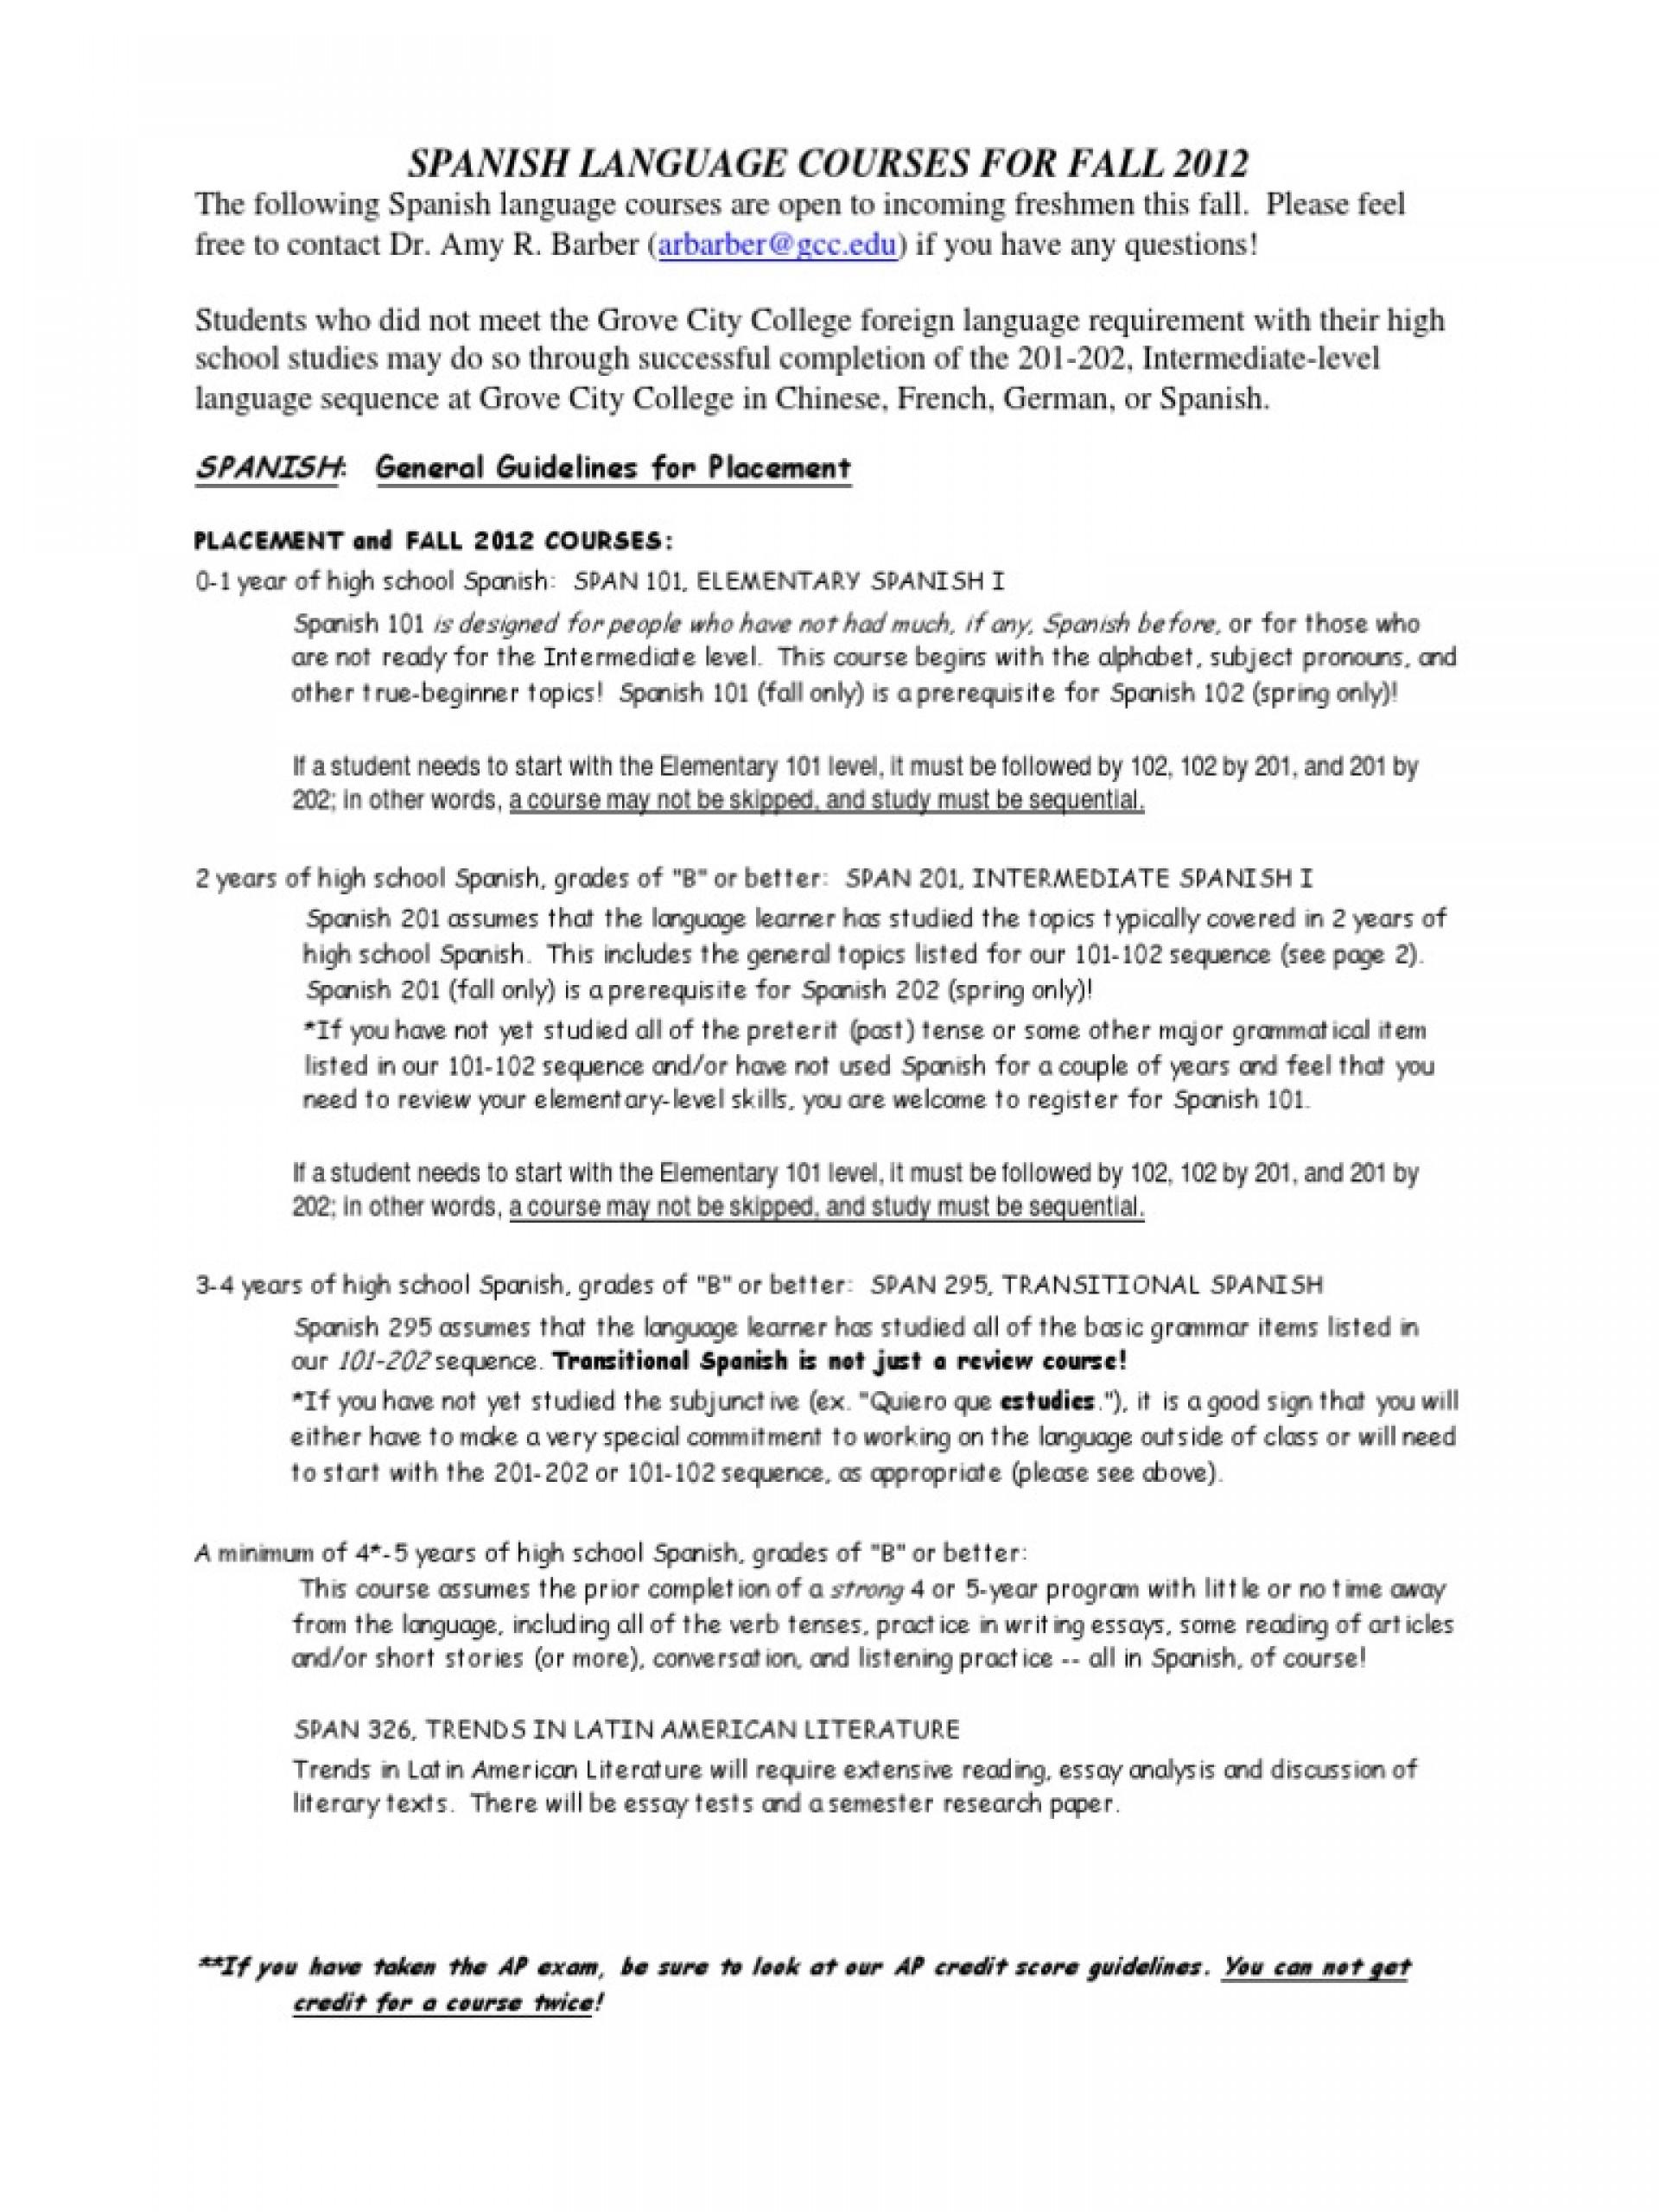 004 Essay In Spanish About School Example Guide 58b2d4b8b6d87fc34f8b4772 Unusual 1920